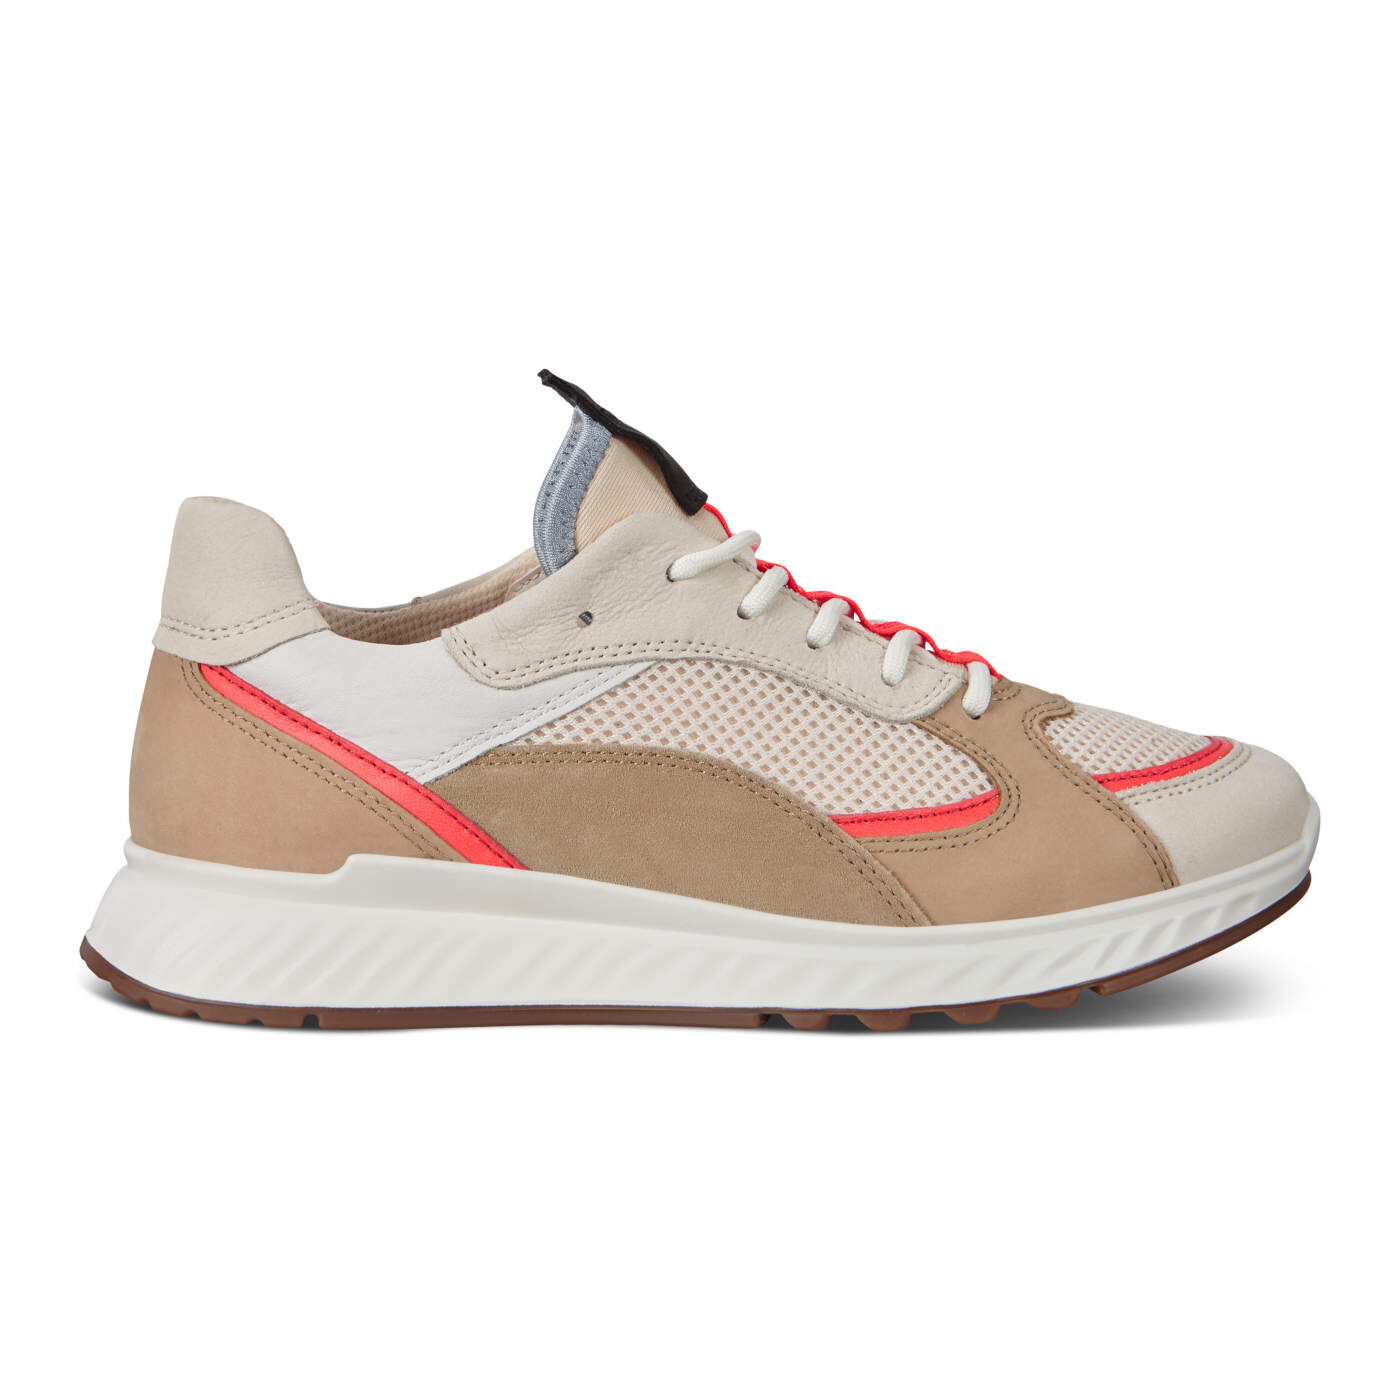 ecco womens sneakers sale